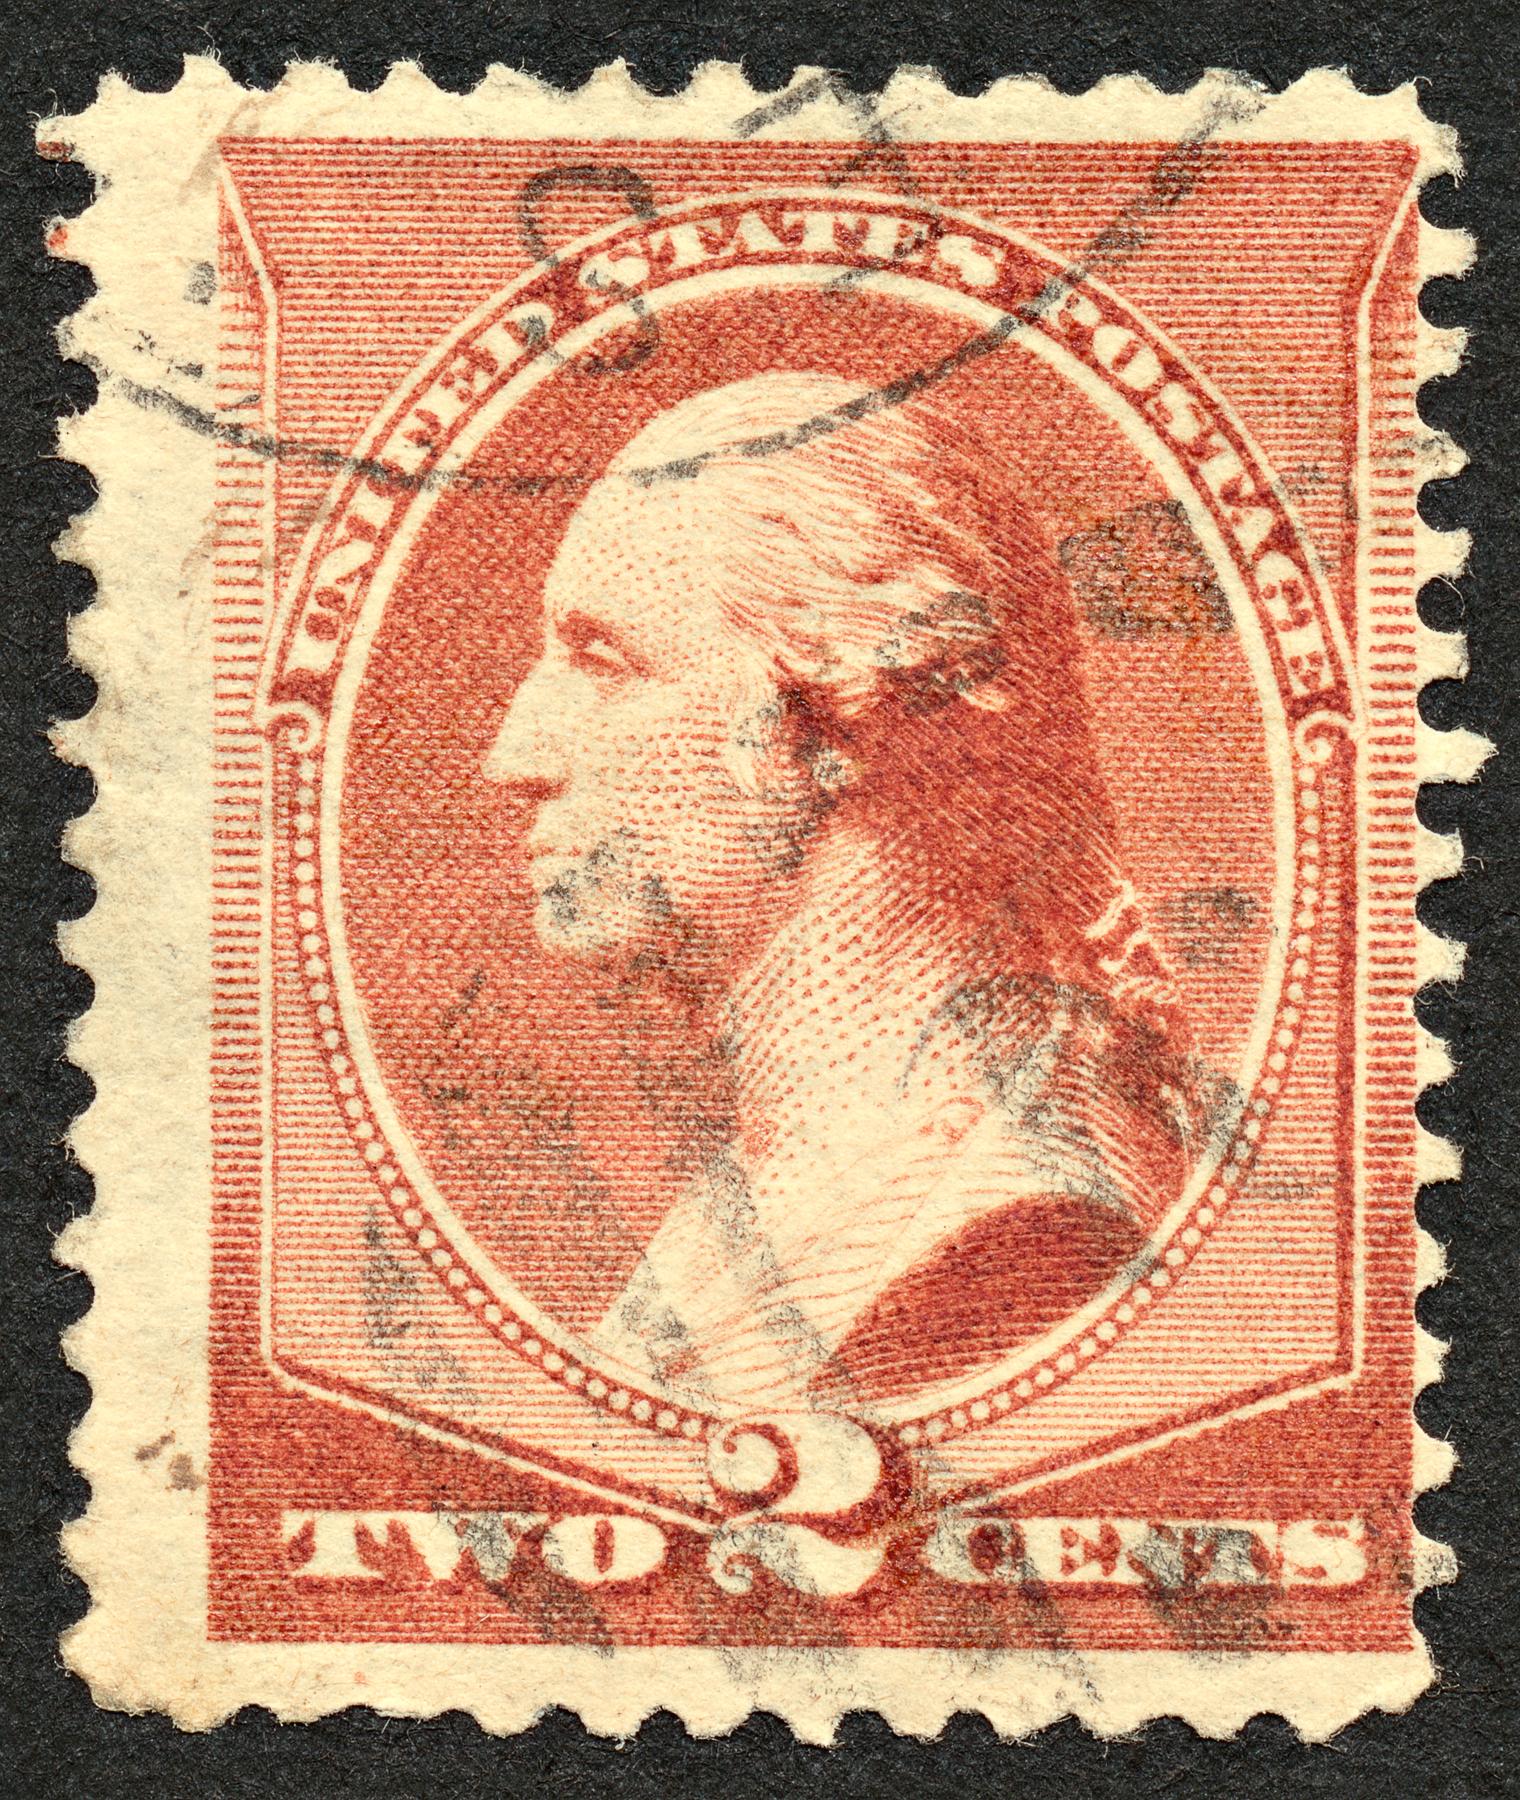 Brown George Washington Stamp, 2, President, Scrap, Retro, HQ Photo